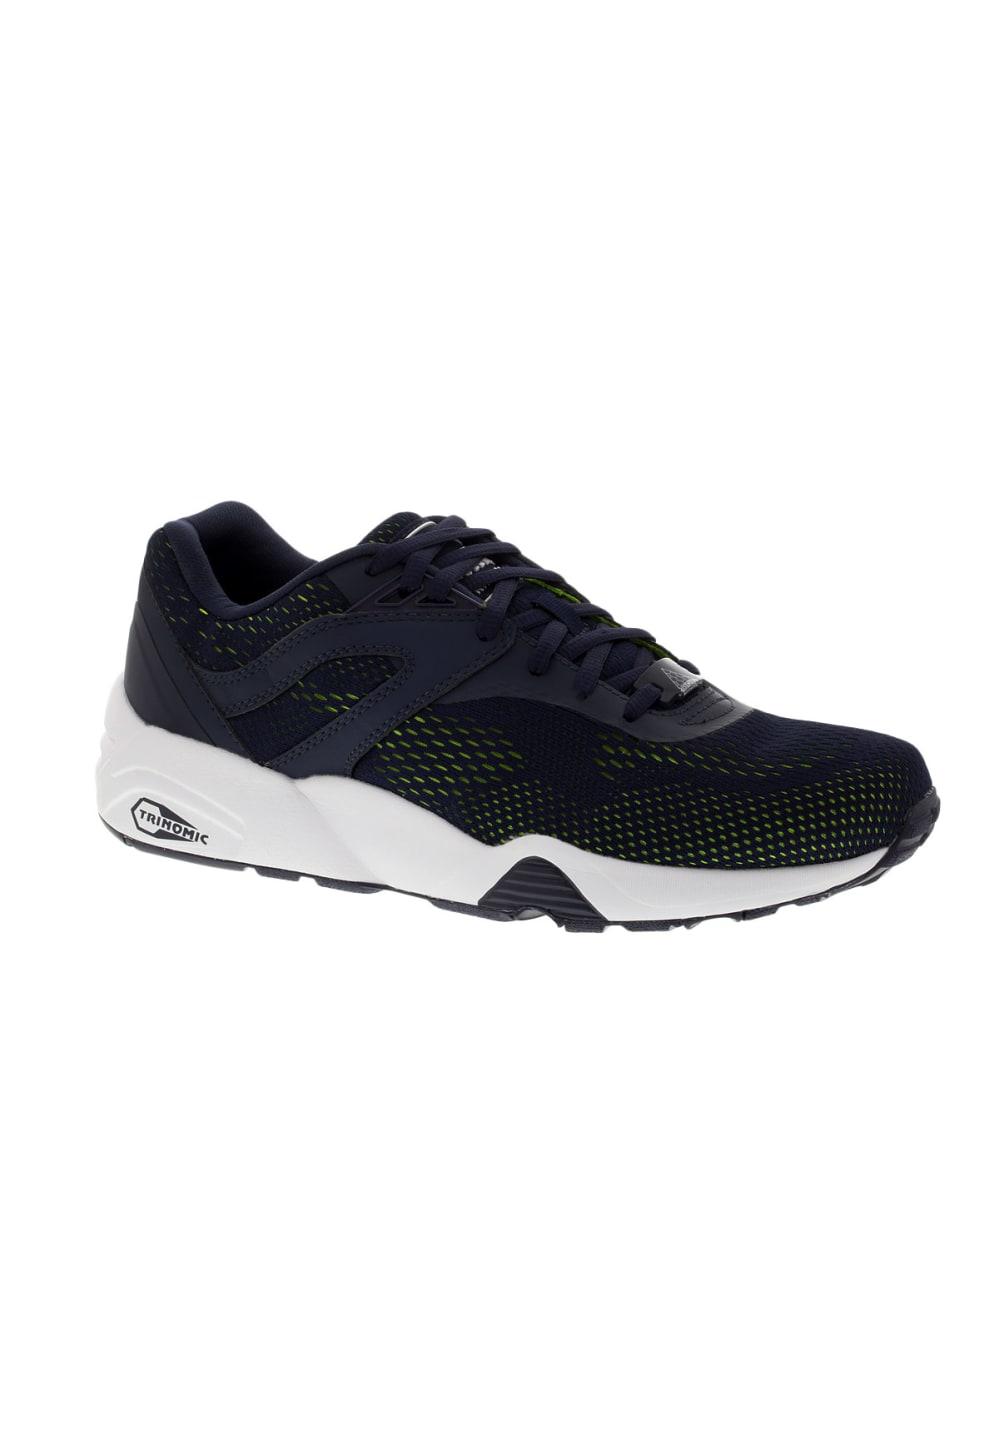 d4749b3fa7167b Puma R698 Eng. Mesh - Sneaker for Men - Black